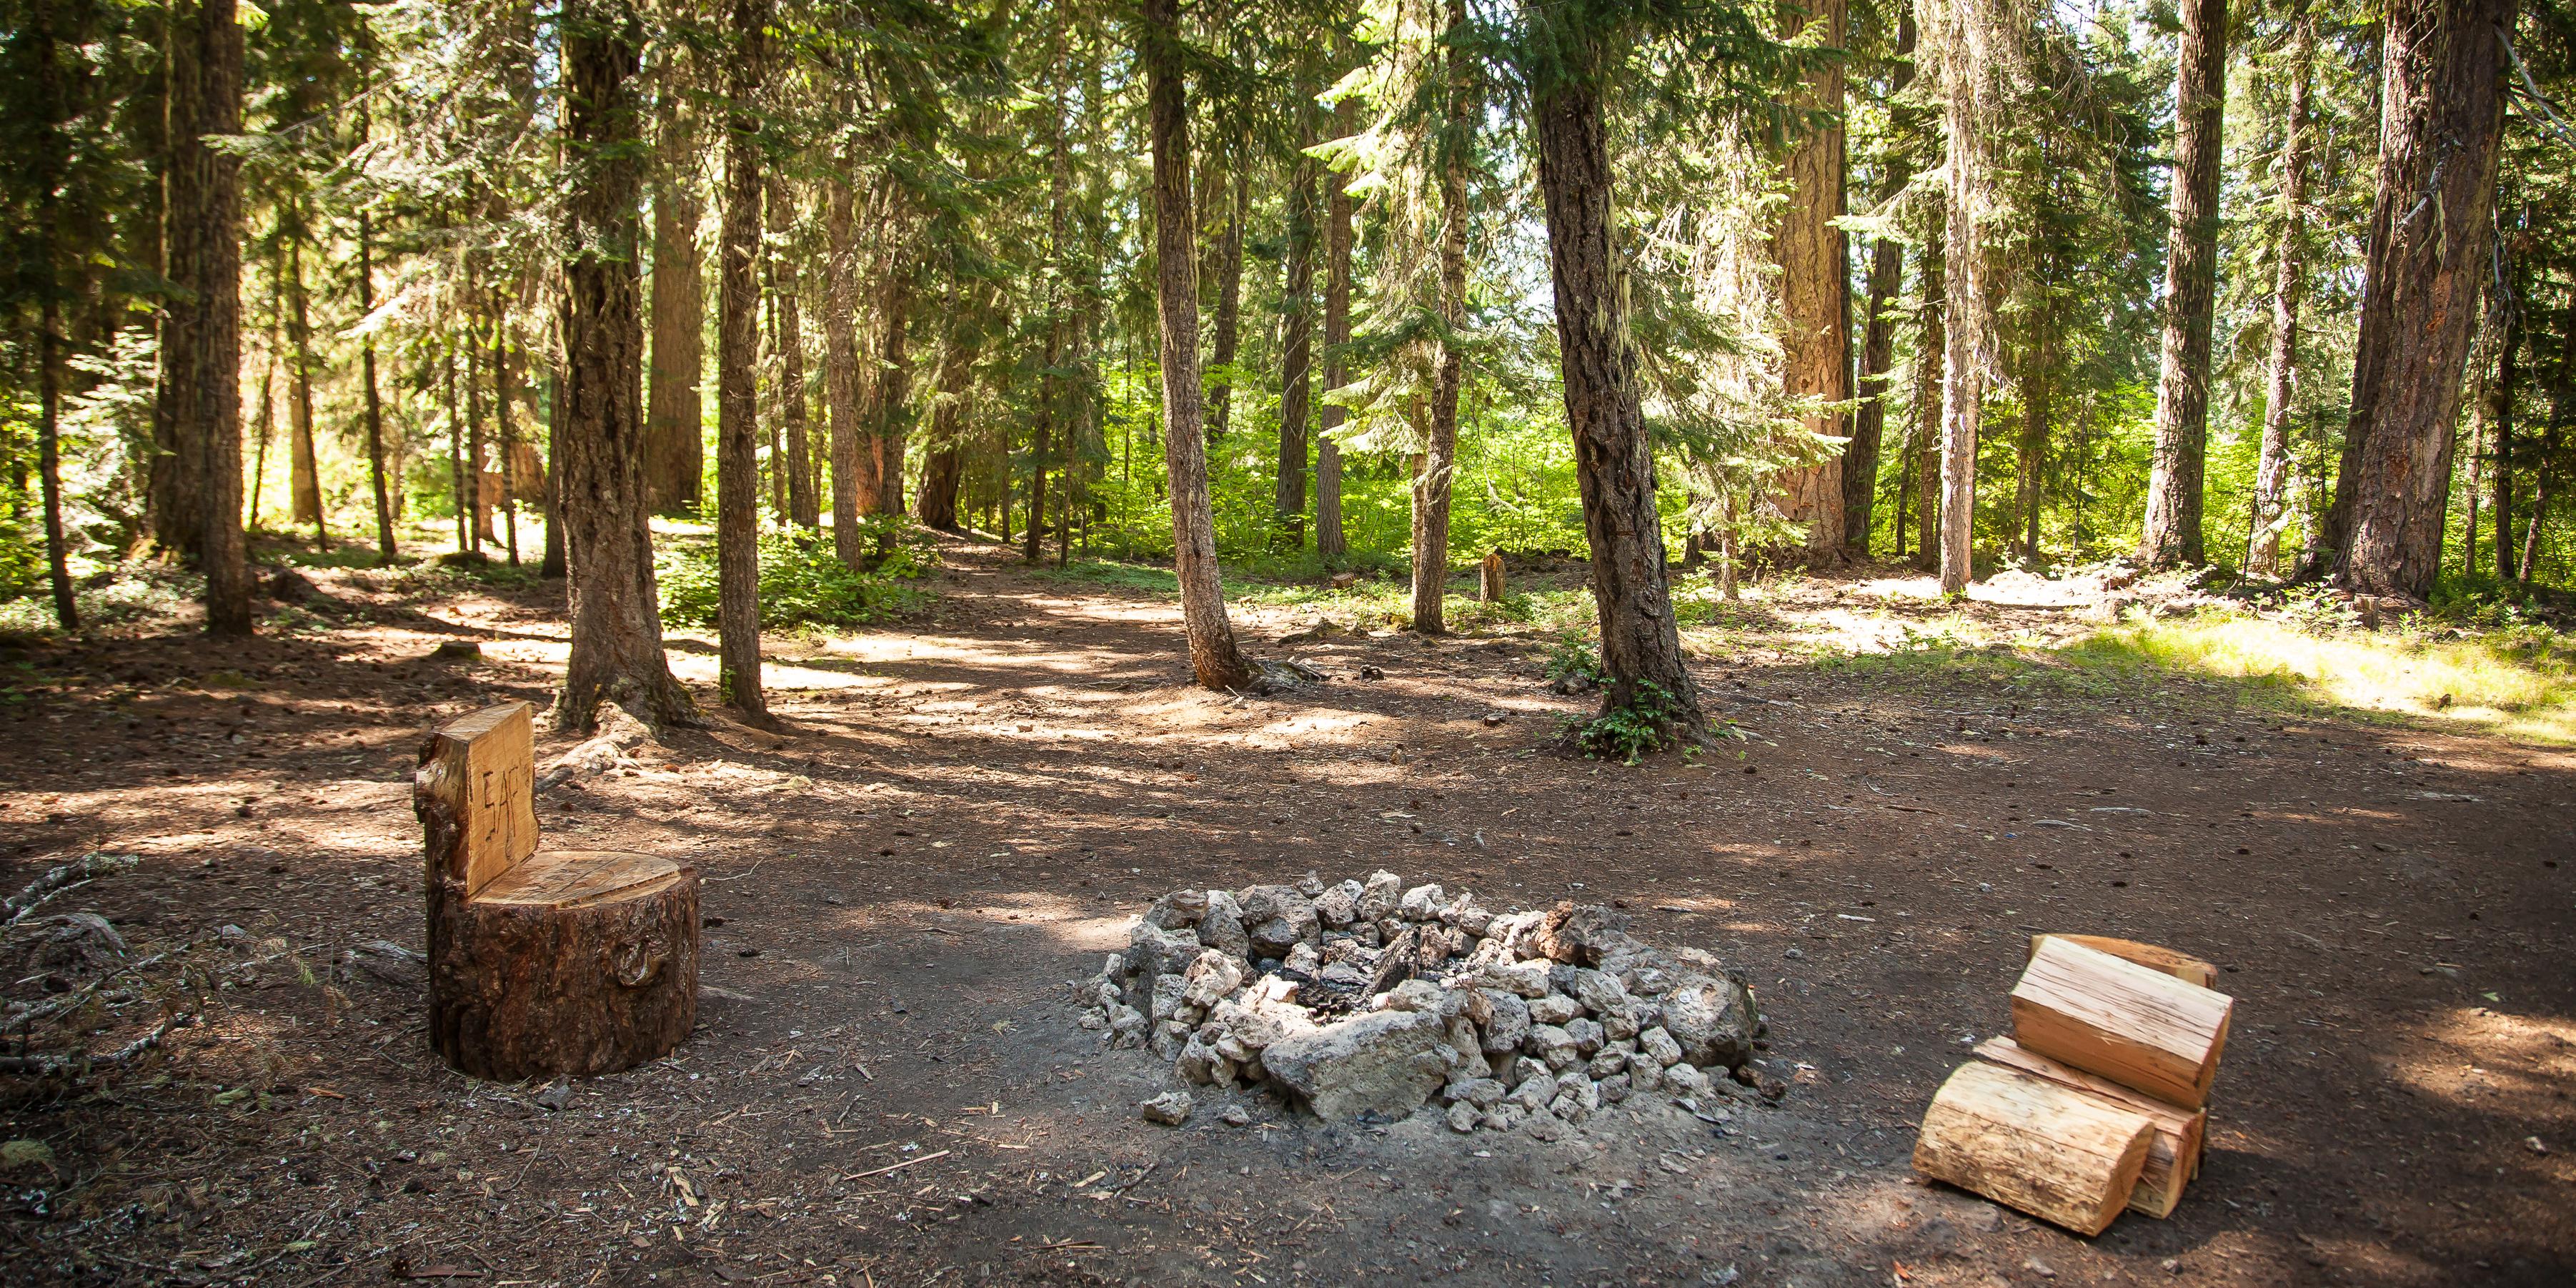 Fish lake campsites camping in oregon for Fish lake camping